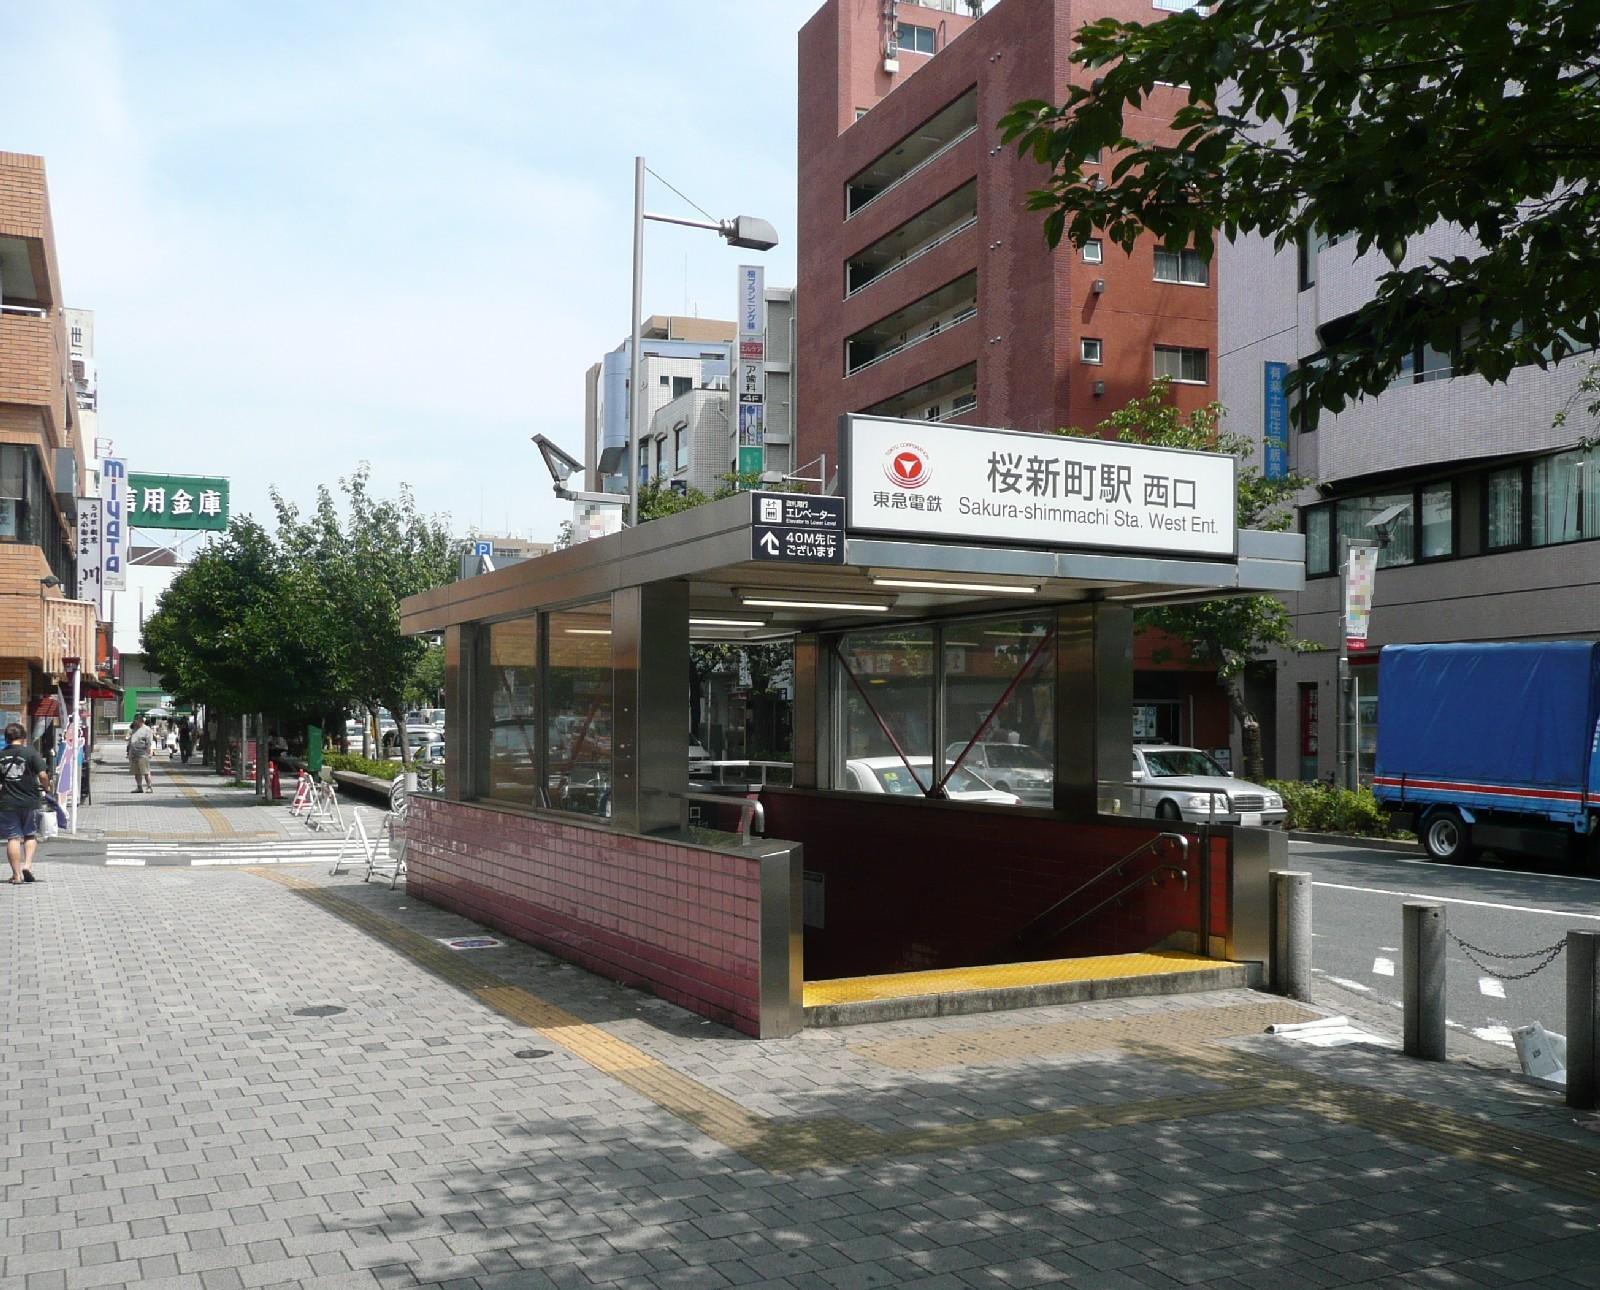 Sakura-shimmachi-sta-West.JPG